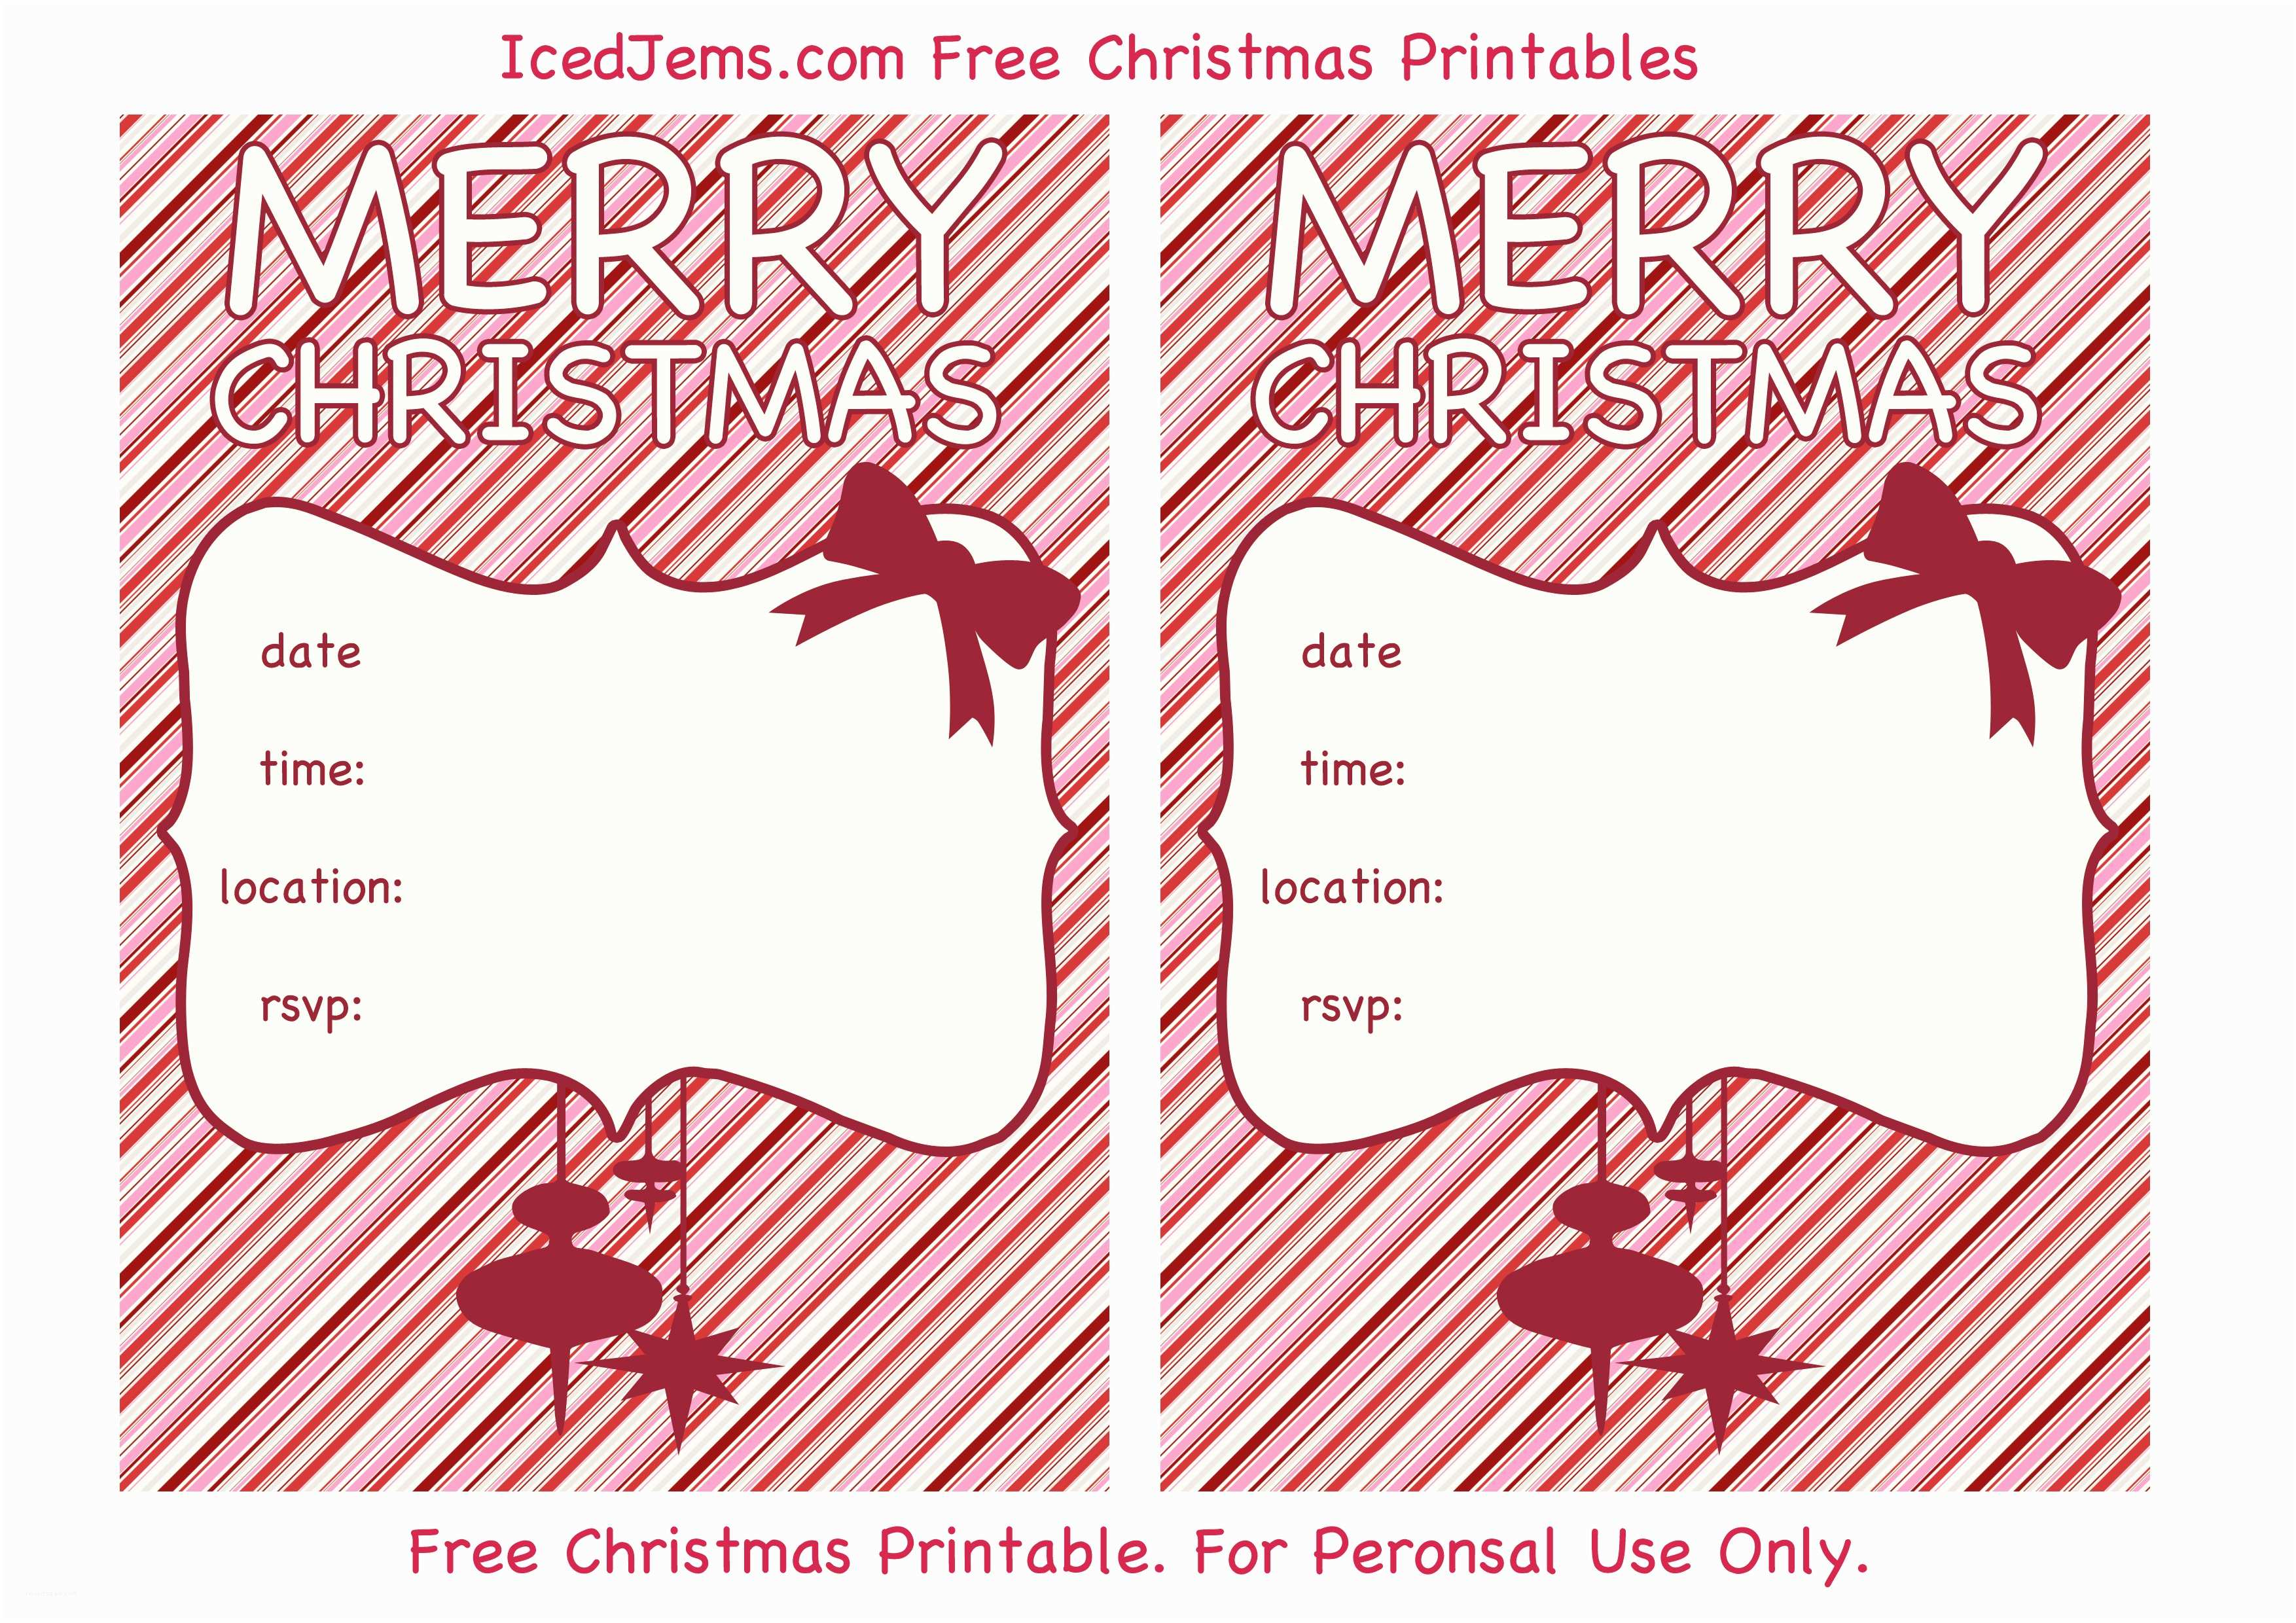 Printable Christmas Party Invitations Free Christmas Party Printables